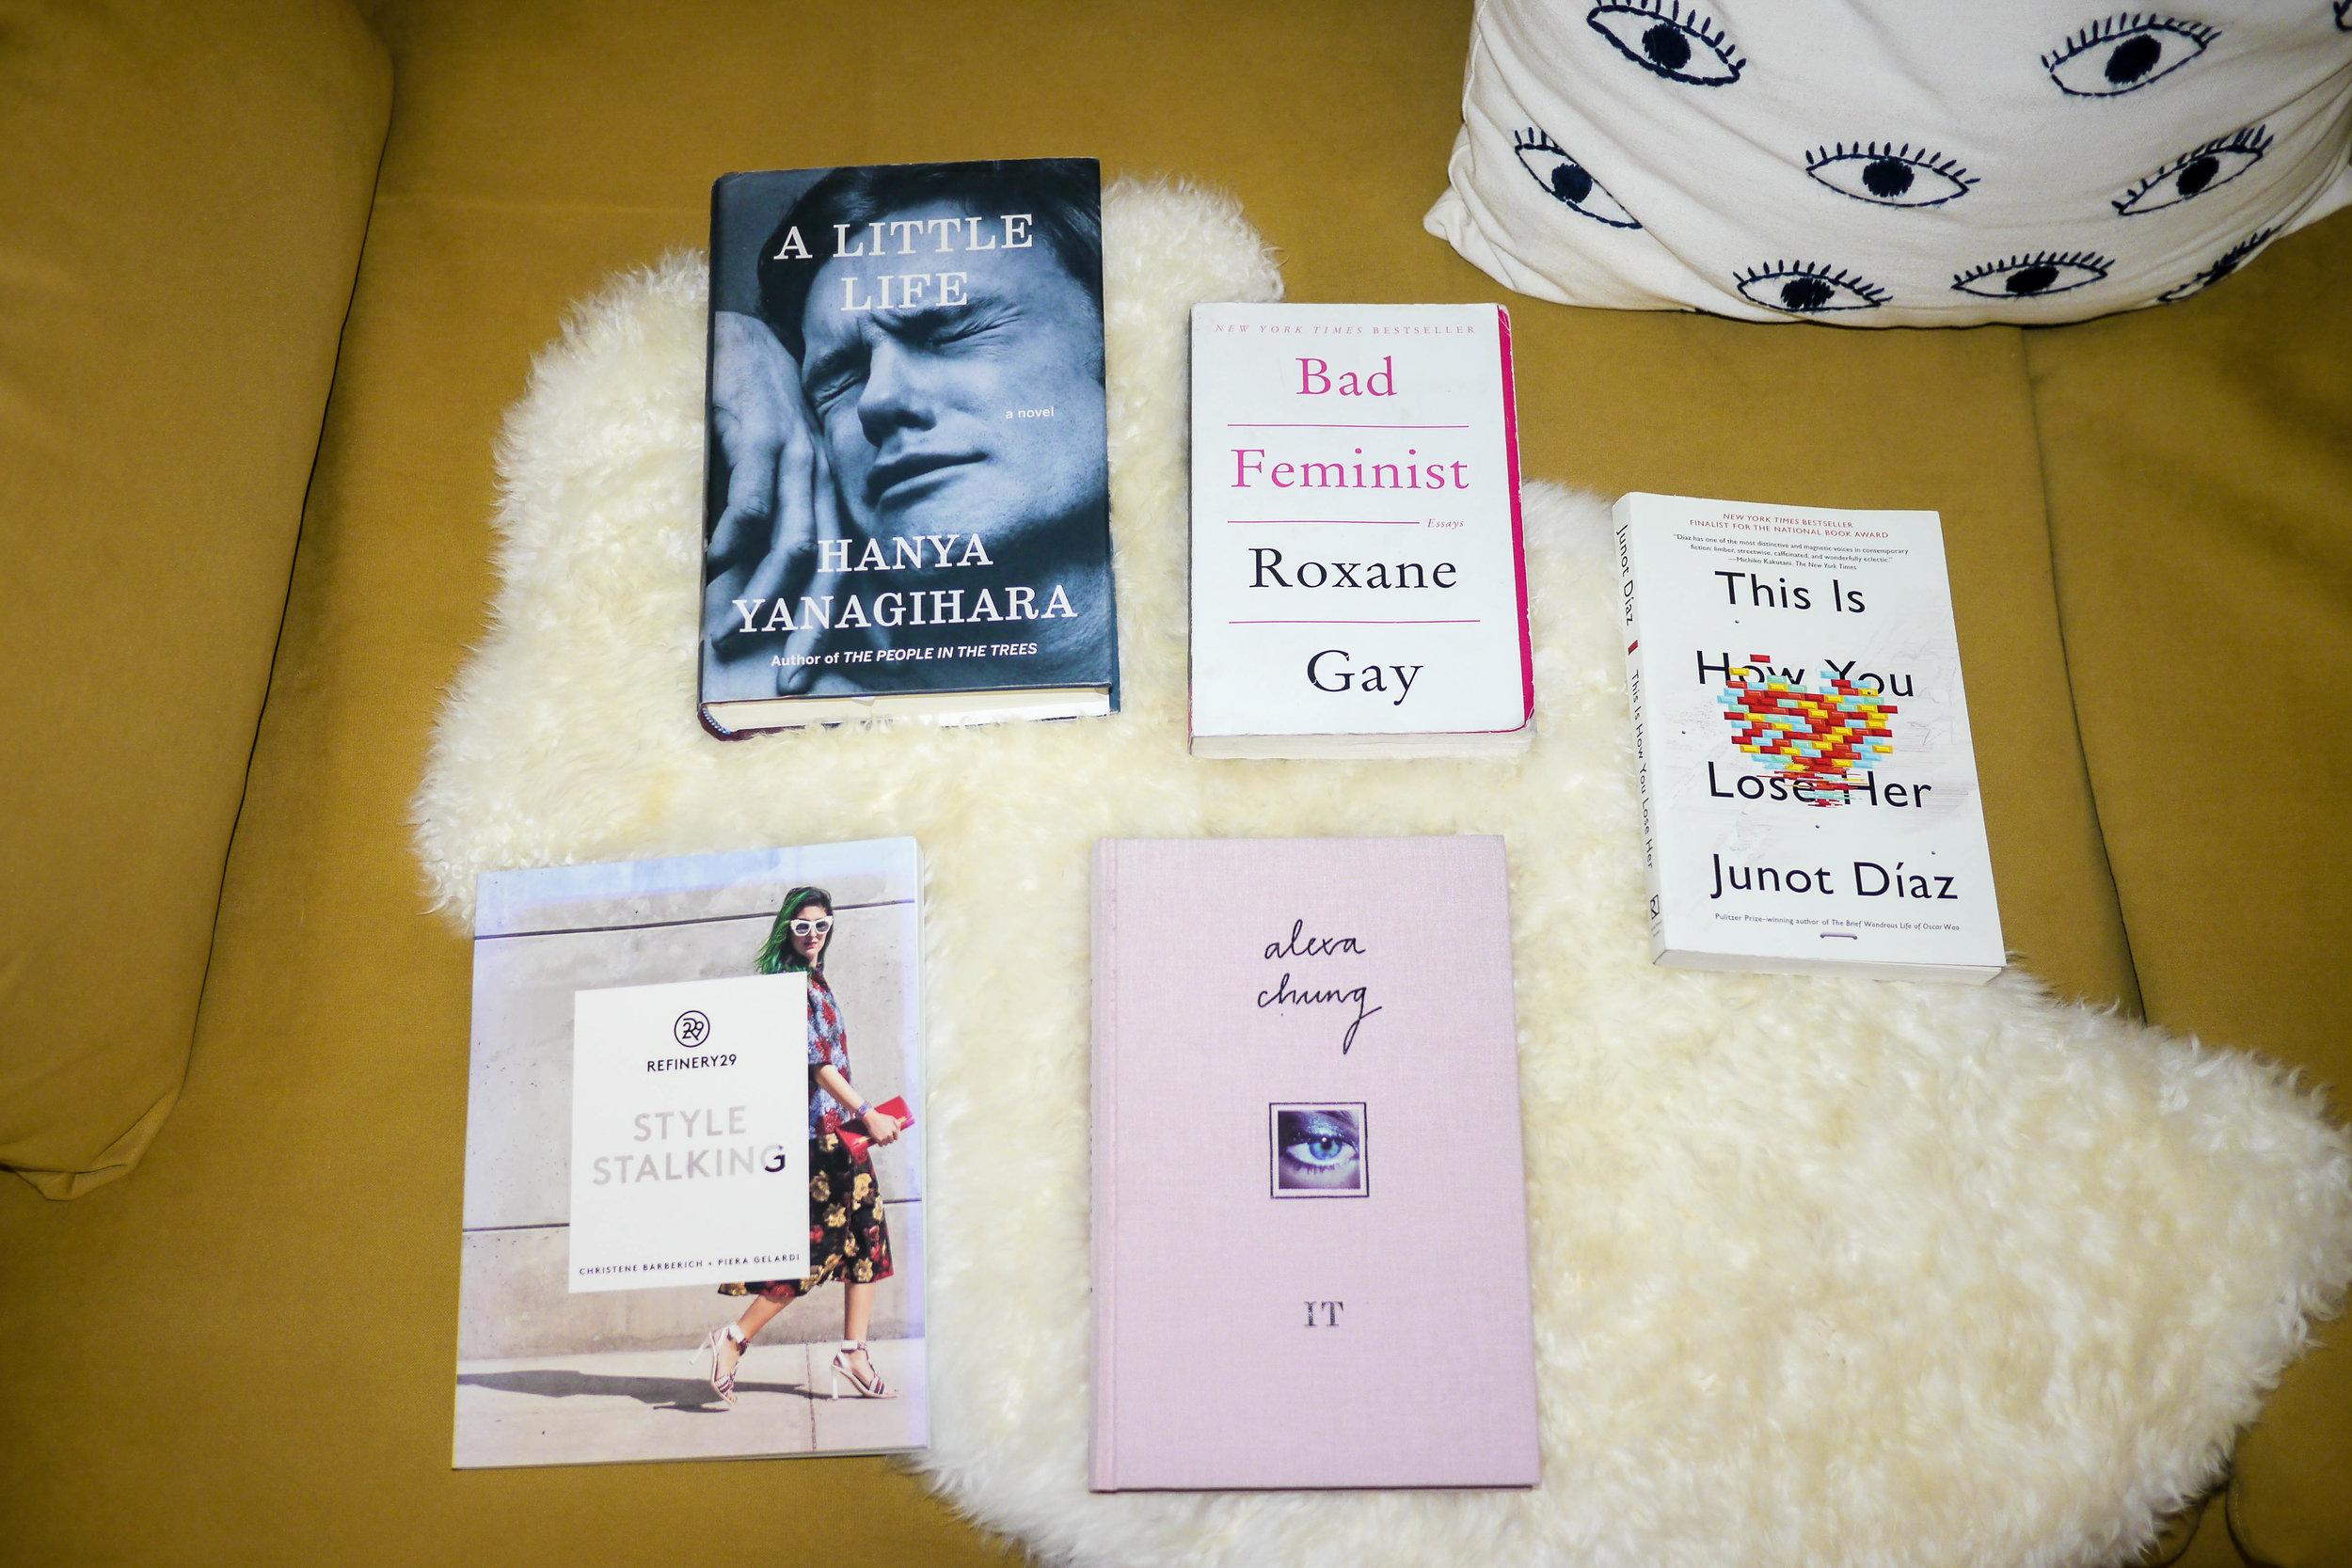 Alyssa's favorite books